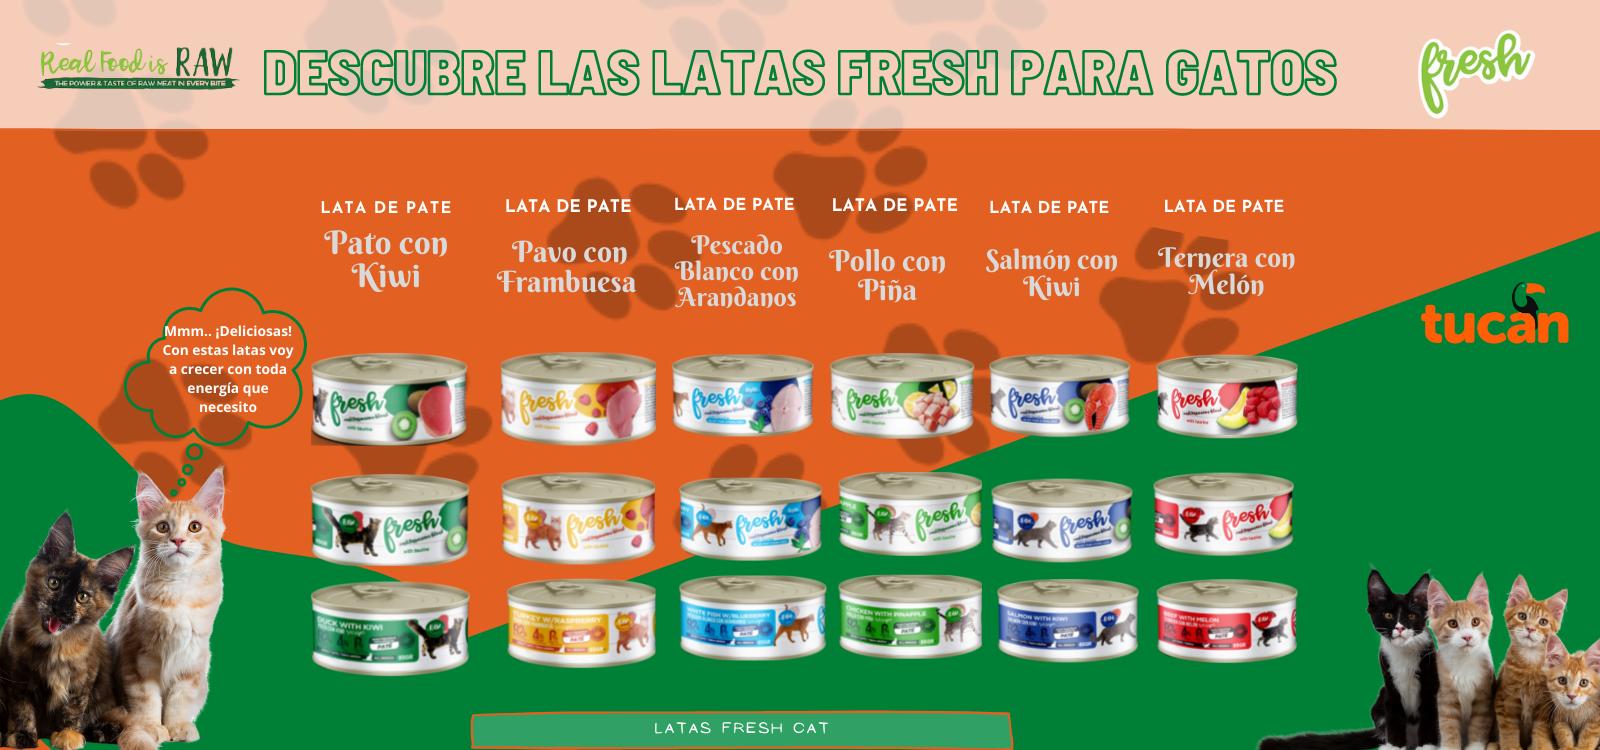 Latas fresh